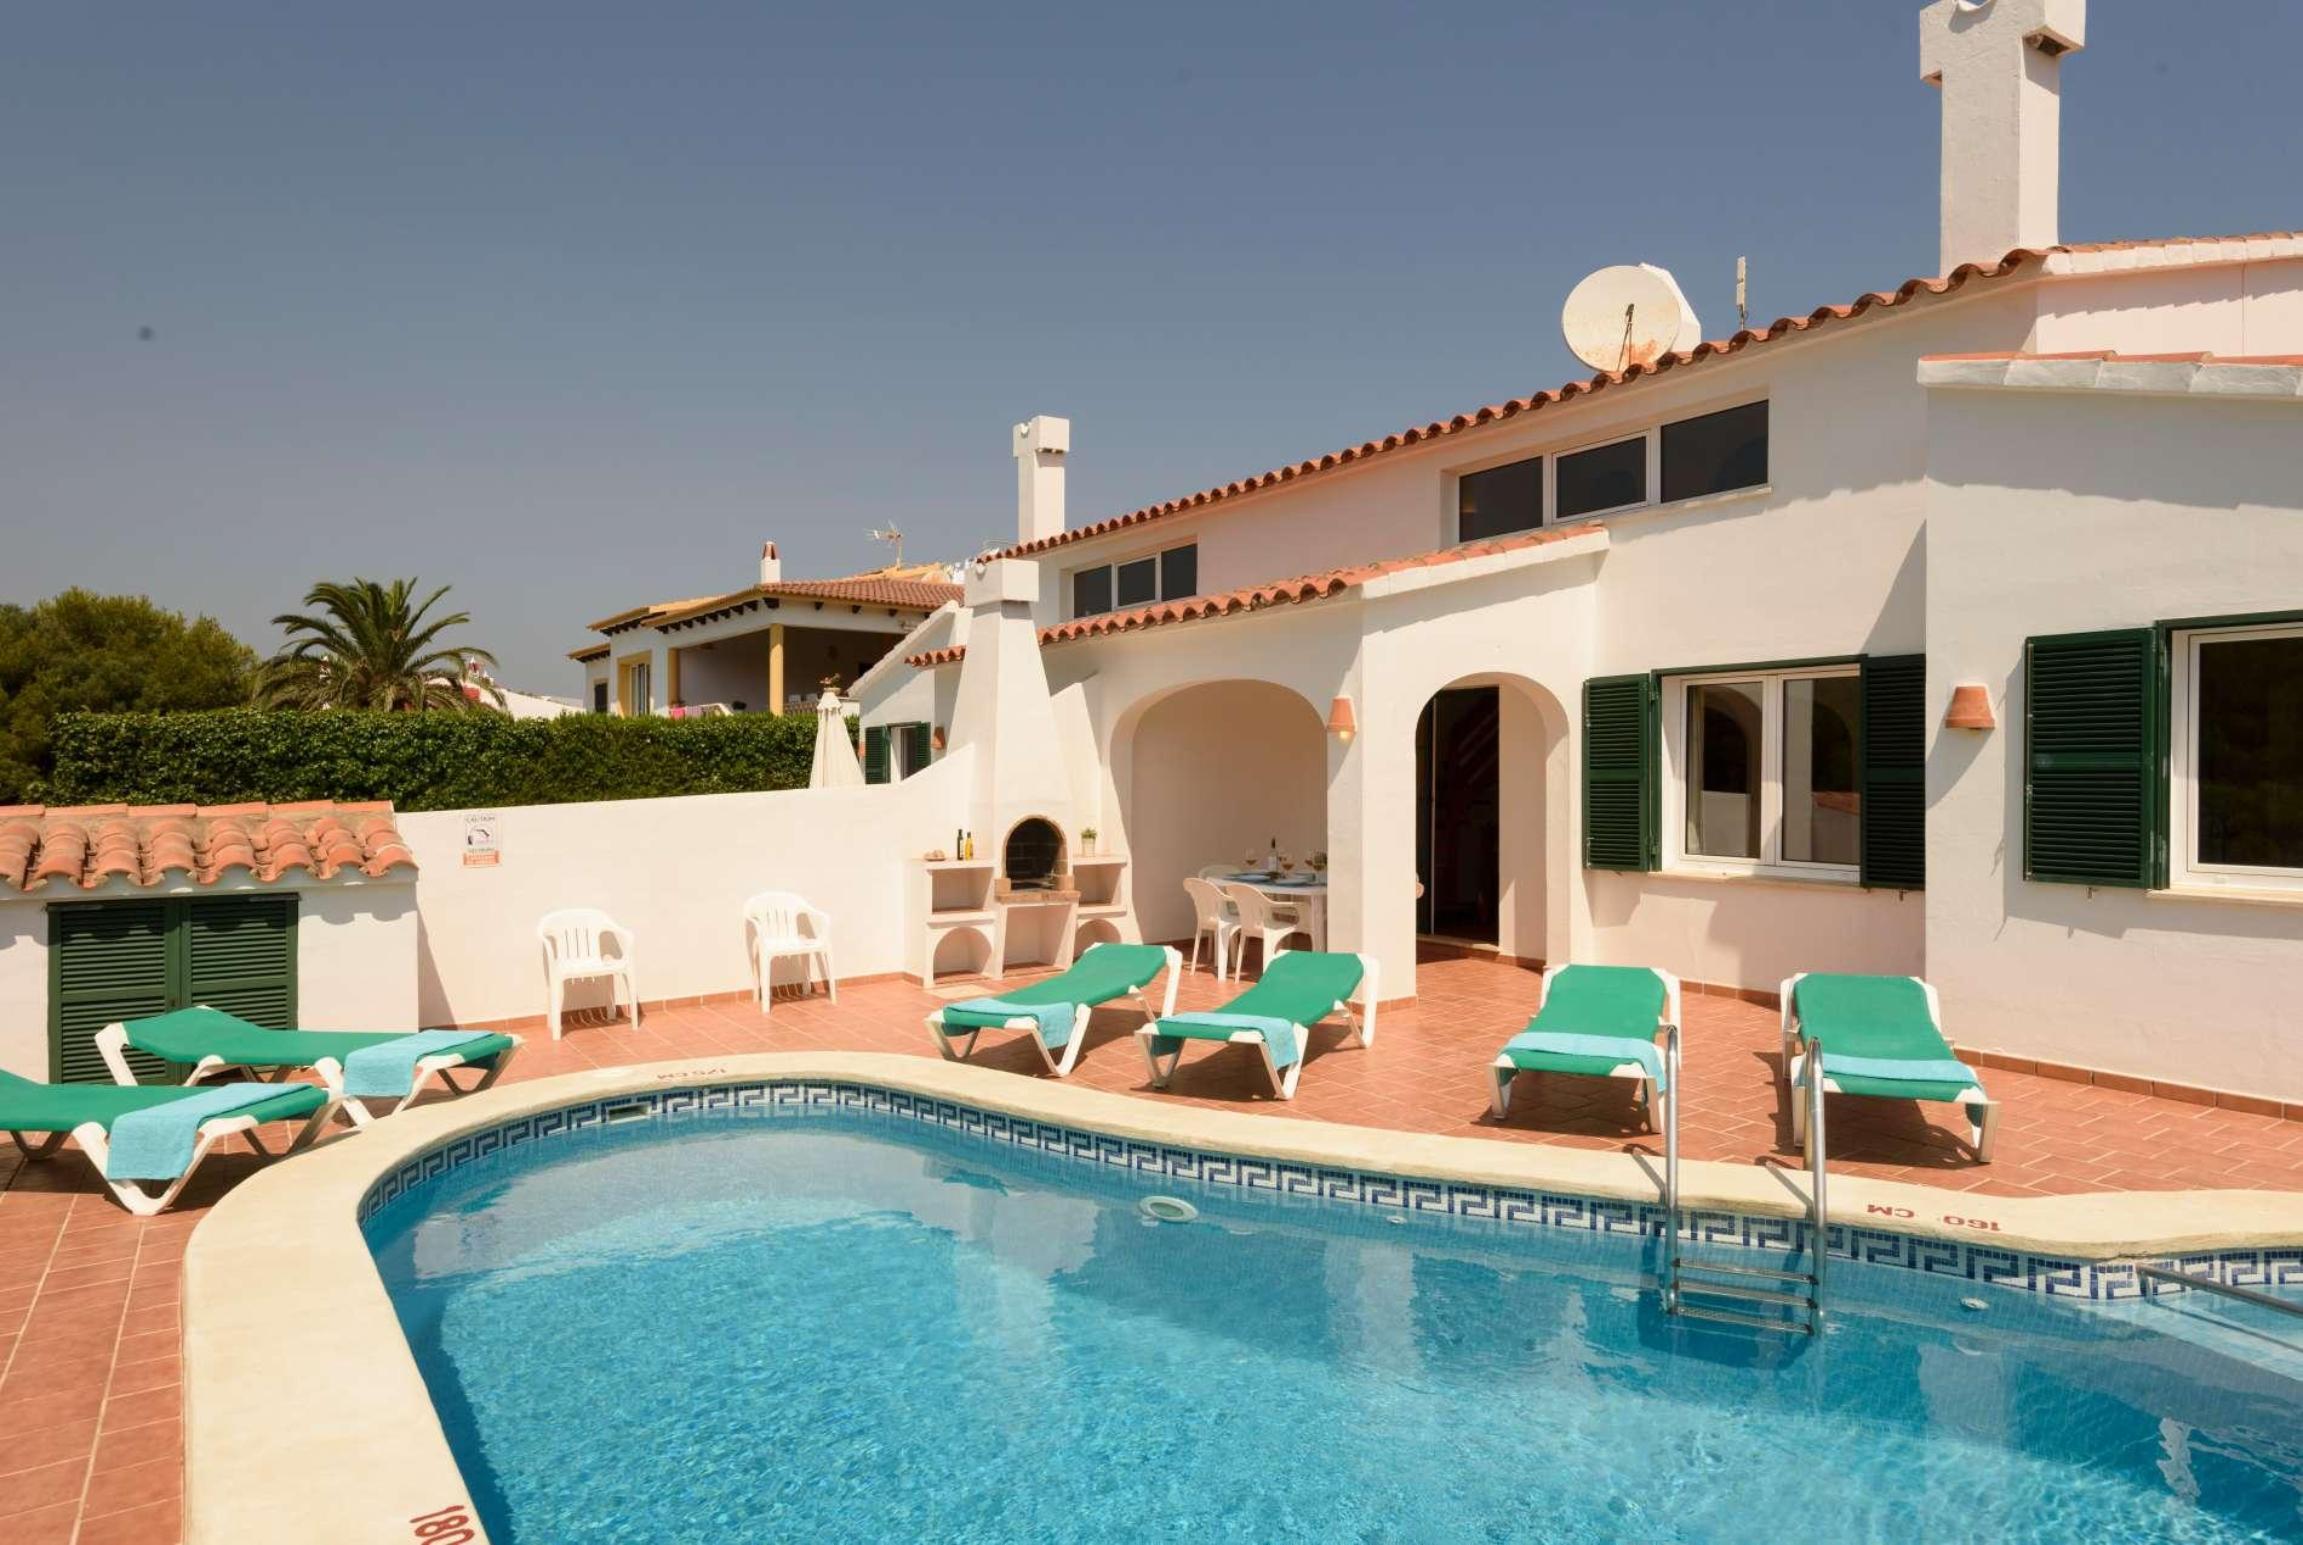 Ferienhaus Eulalia I (2653535), Arenal De'N Castell, Menorca, Balearische Inseln, Spanien, Bild 23